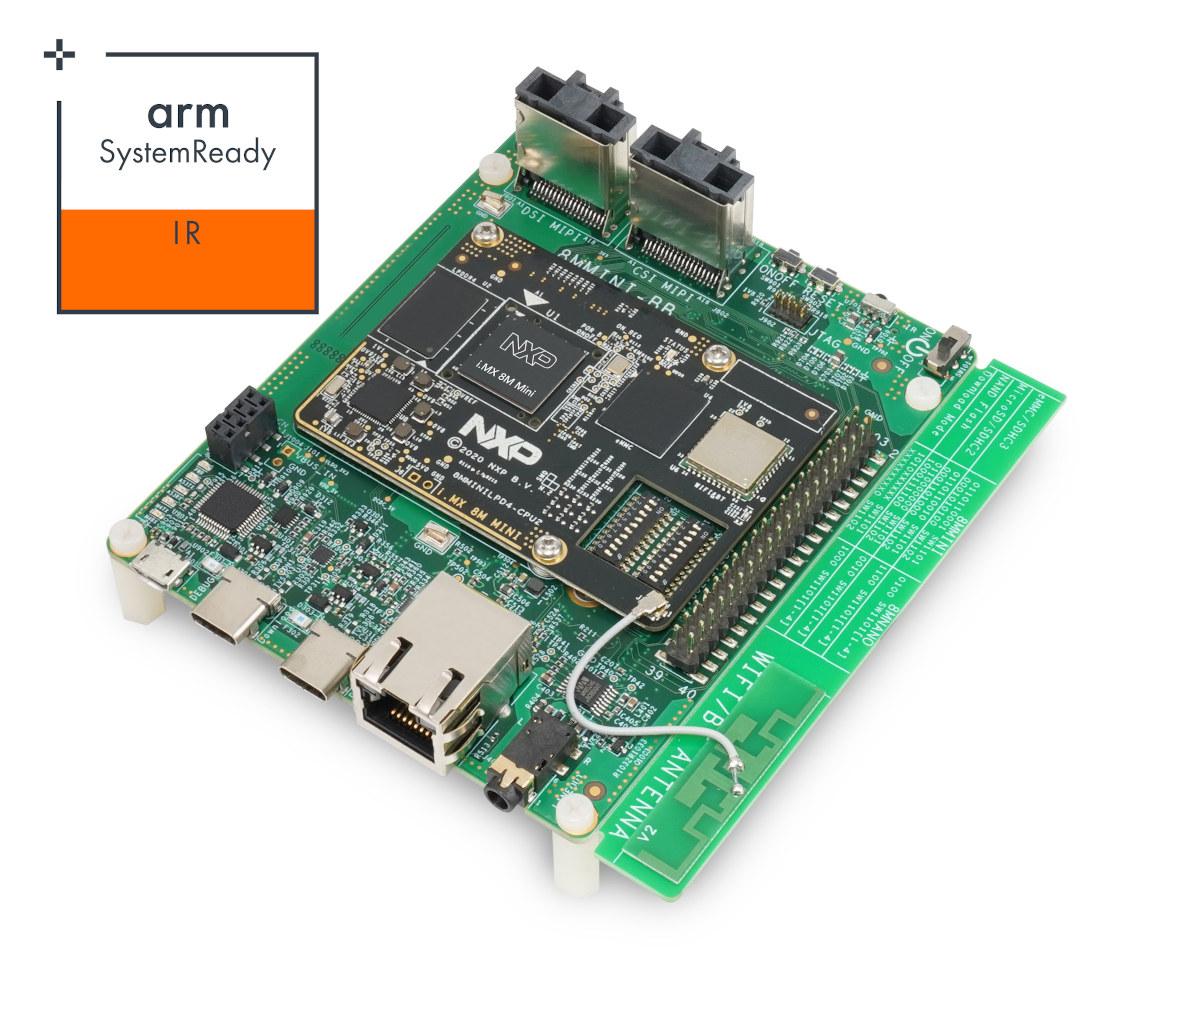 NXP EVK Arm SystemReady IR